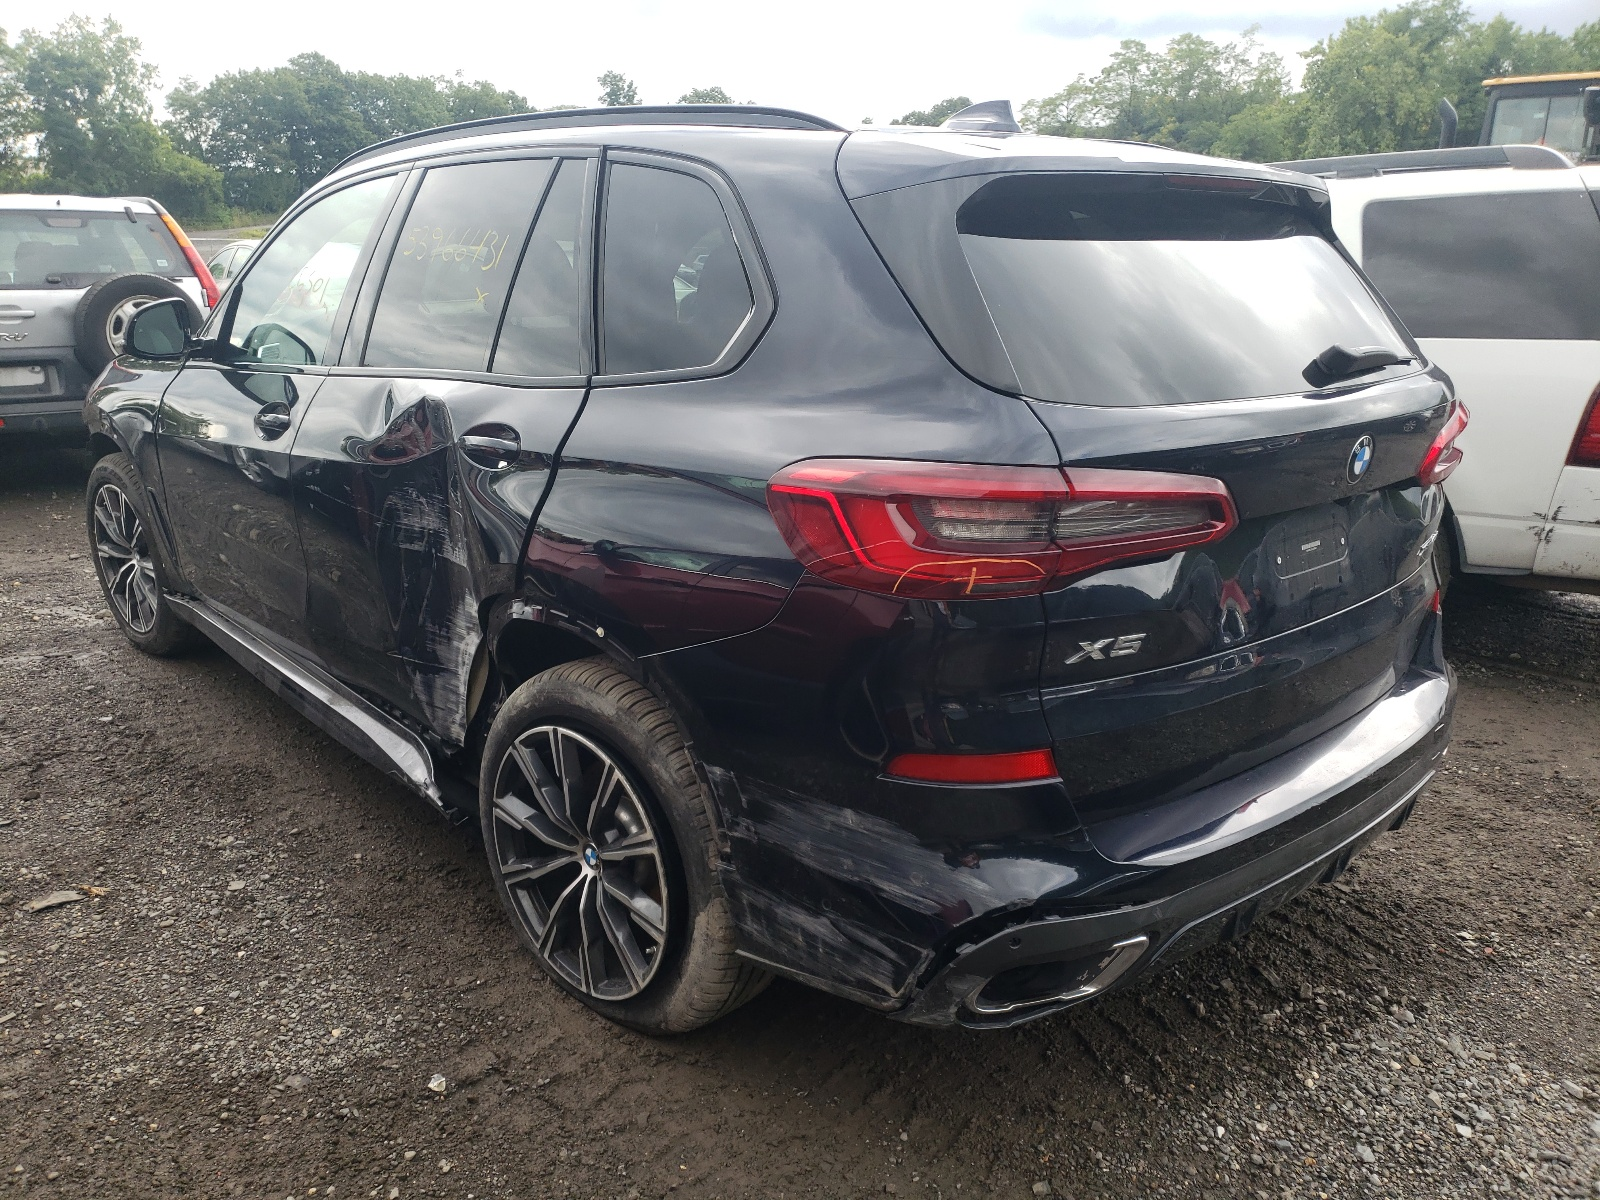 BMW X5 XDRIVE4 2020 VIN 5UXCR6C05LLL82867